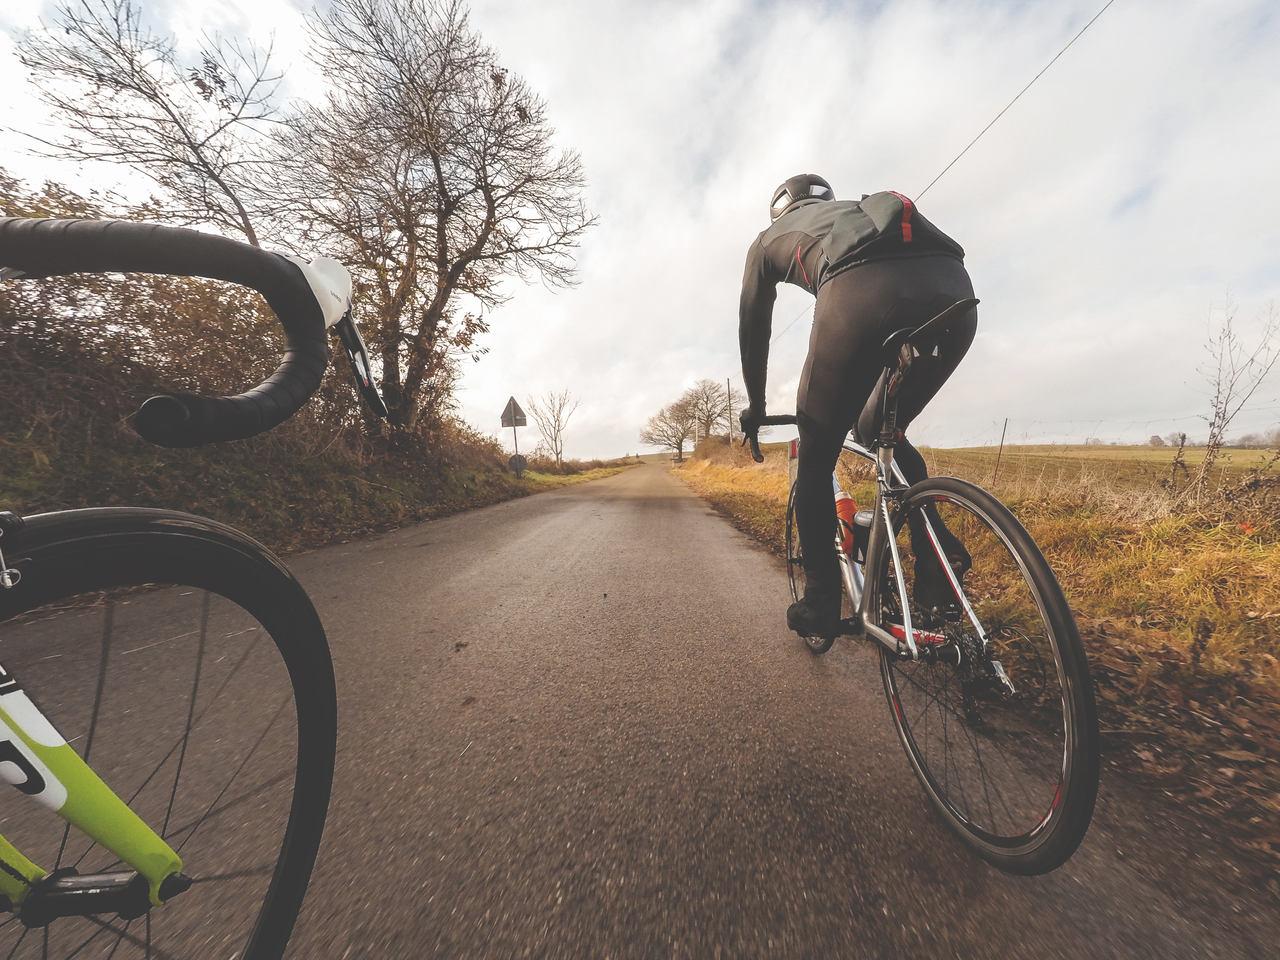 Zimná cyklistika. Foto: Shutterstock